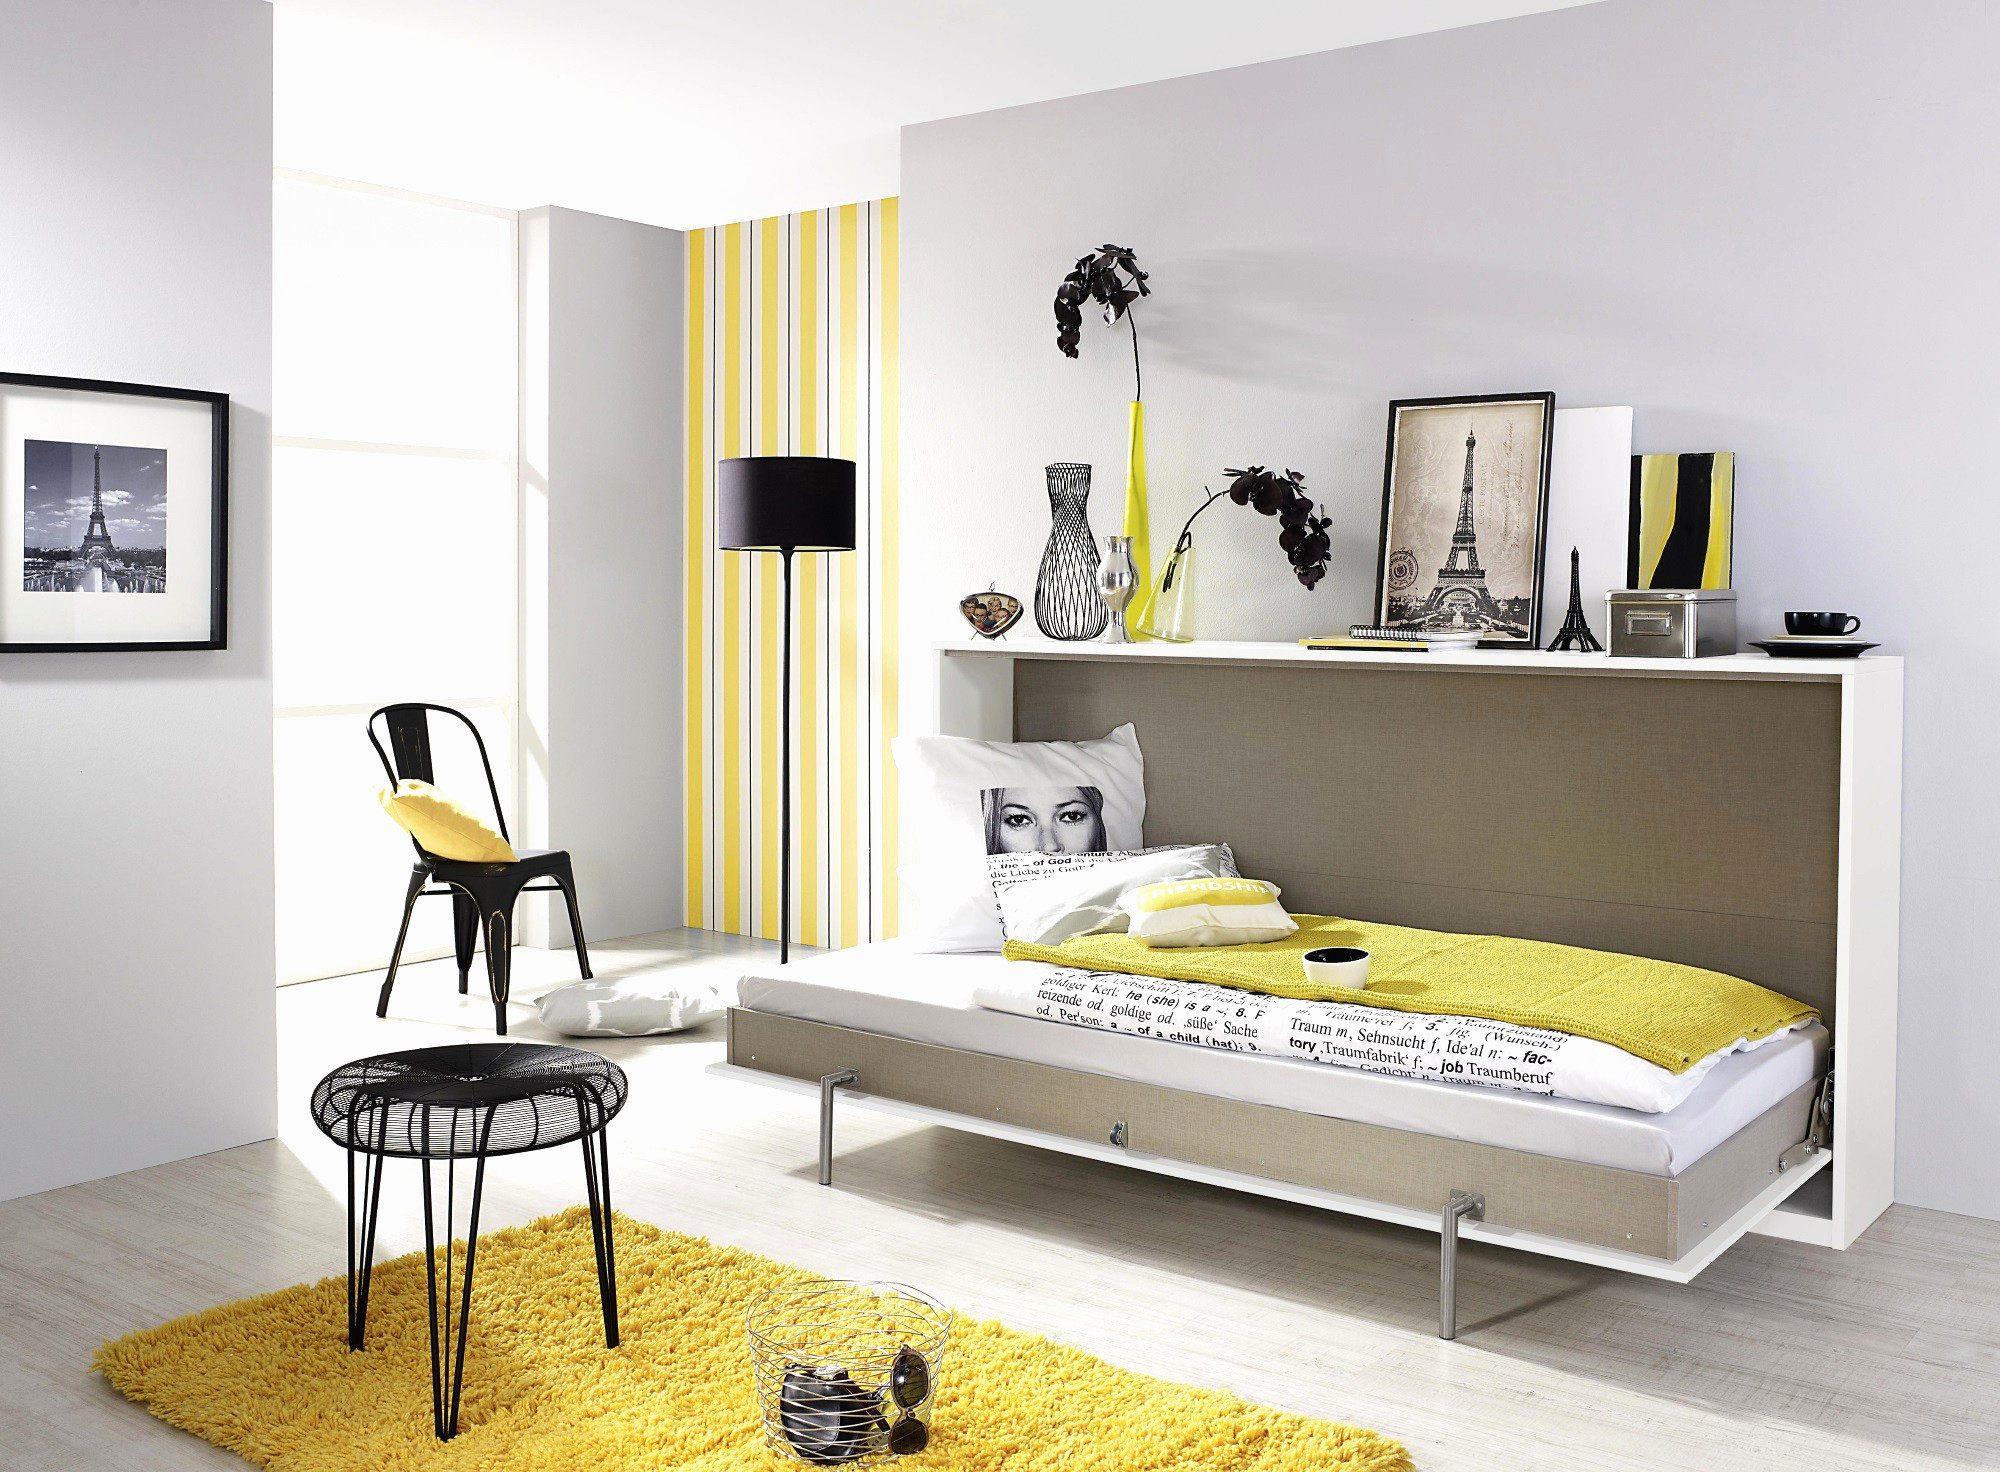 Ikea Lit 160 Magnifique Lit Sniglar Ikea Ikealit – Faho forfriends